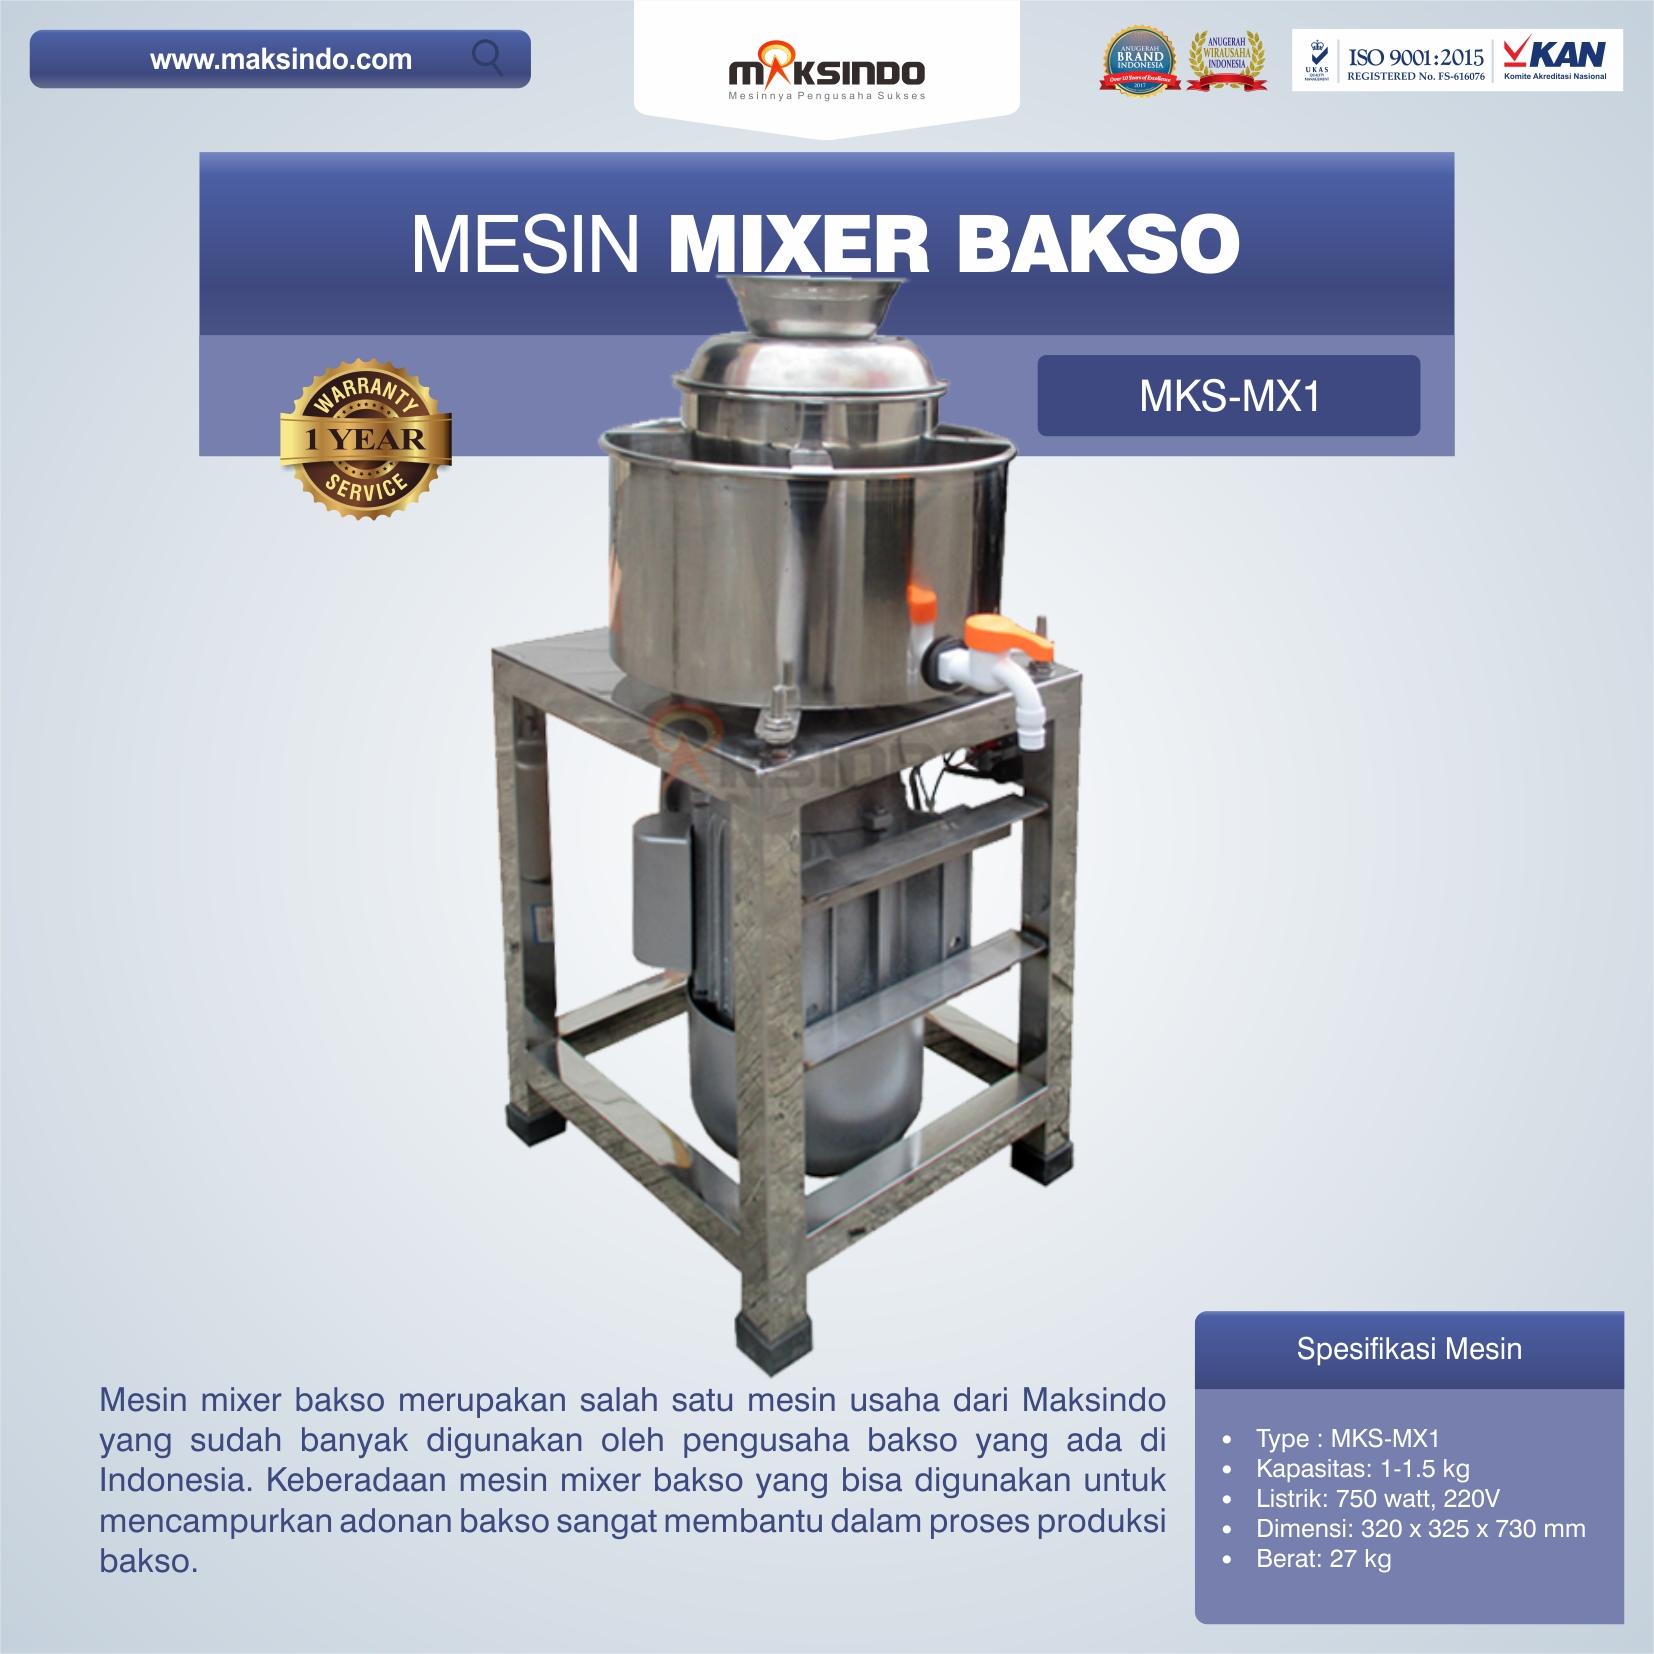 Jual Mesin Mixer Bakso MKS-MX1 di Banjarmasin